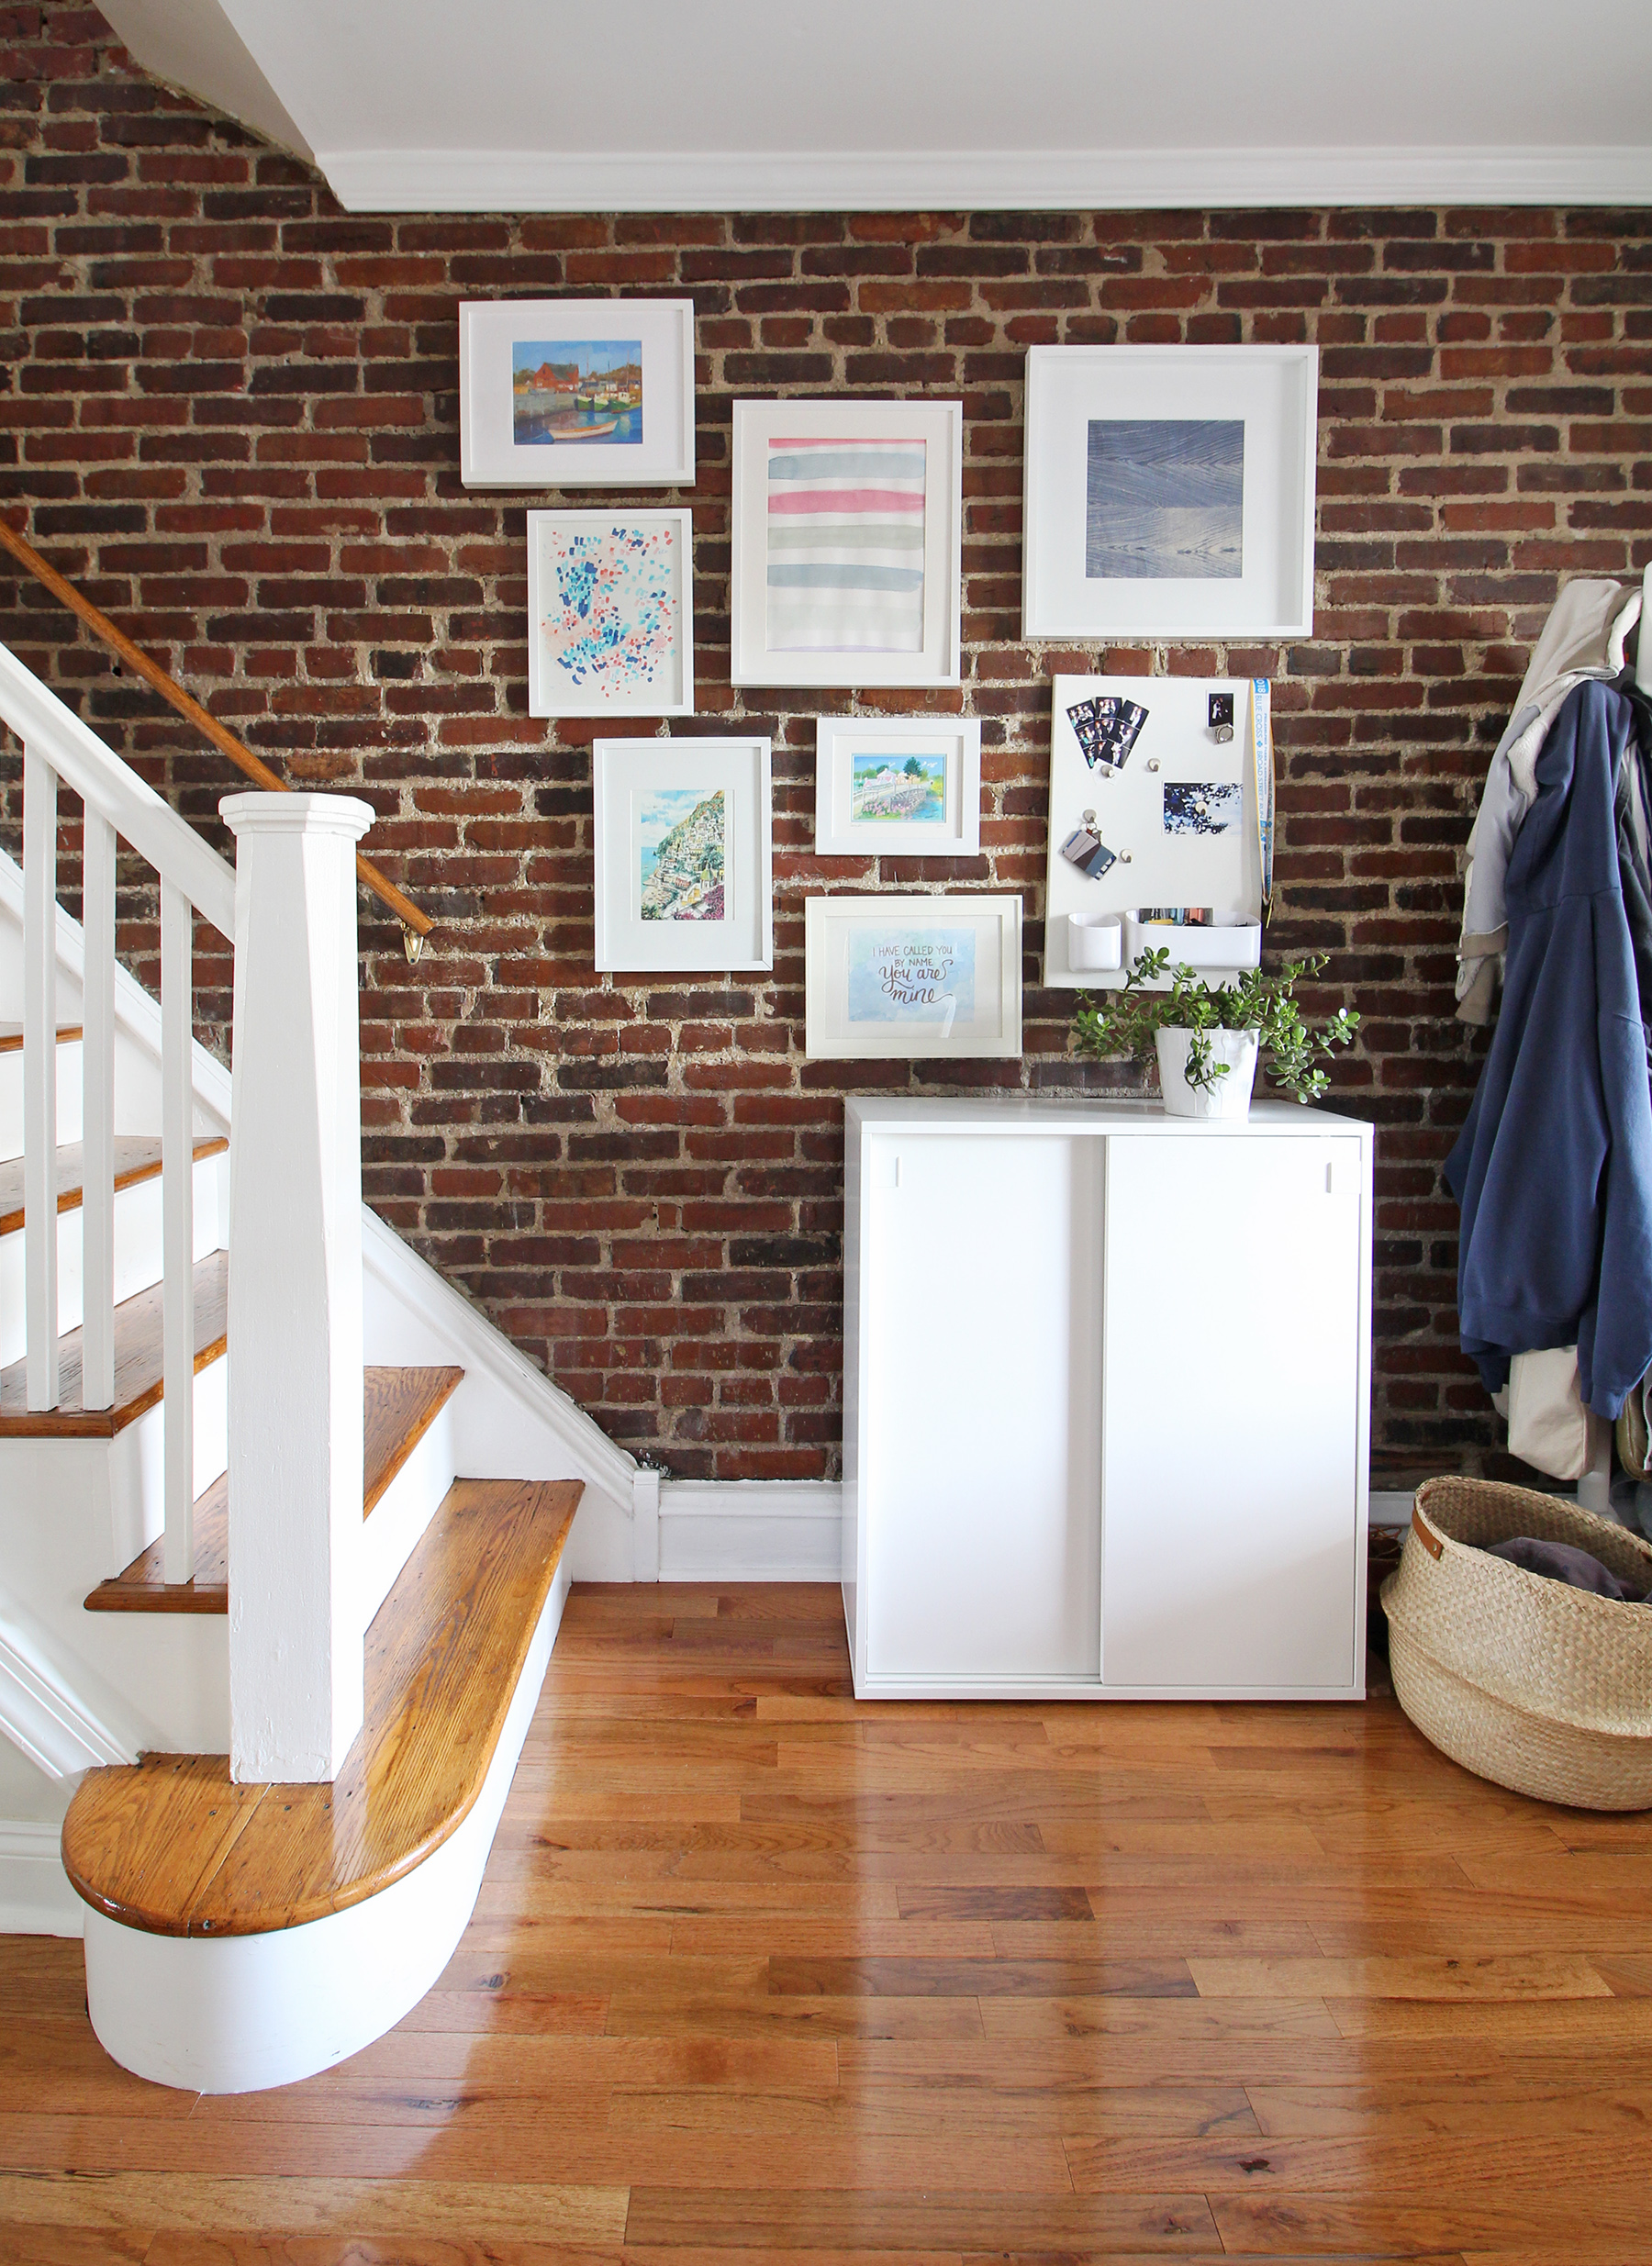 Exposed-Brick-Gallery-Wall-Shoe-Cabinet-Entryway-2.jpg